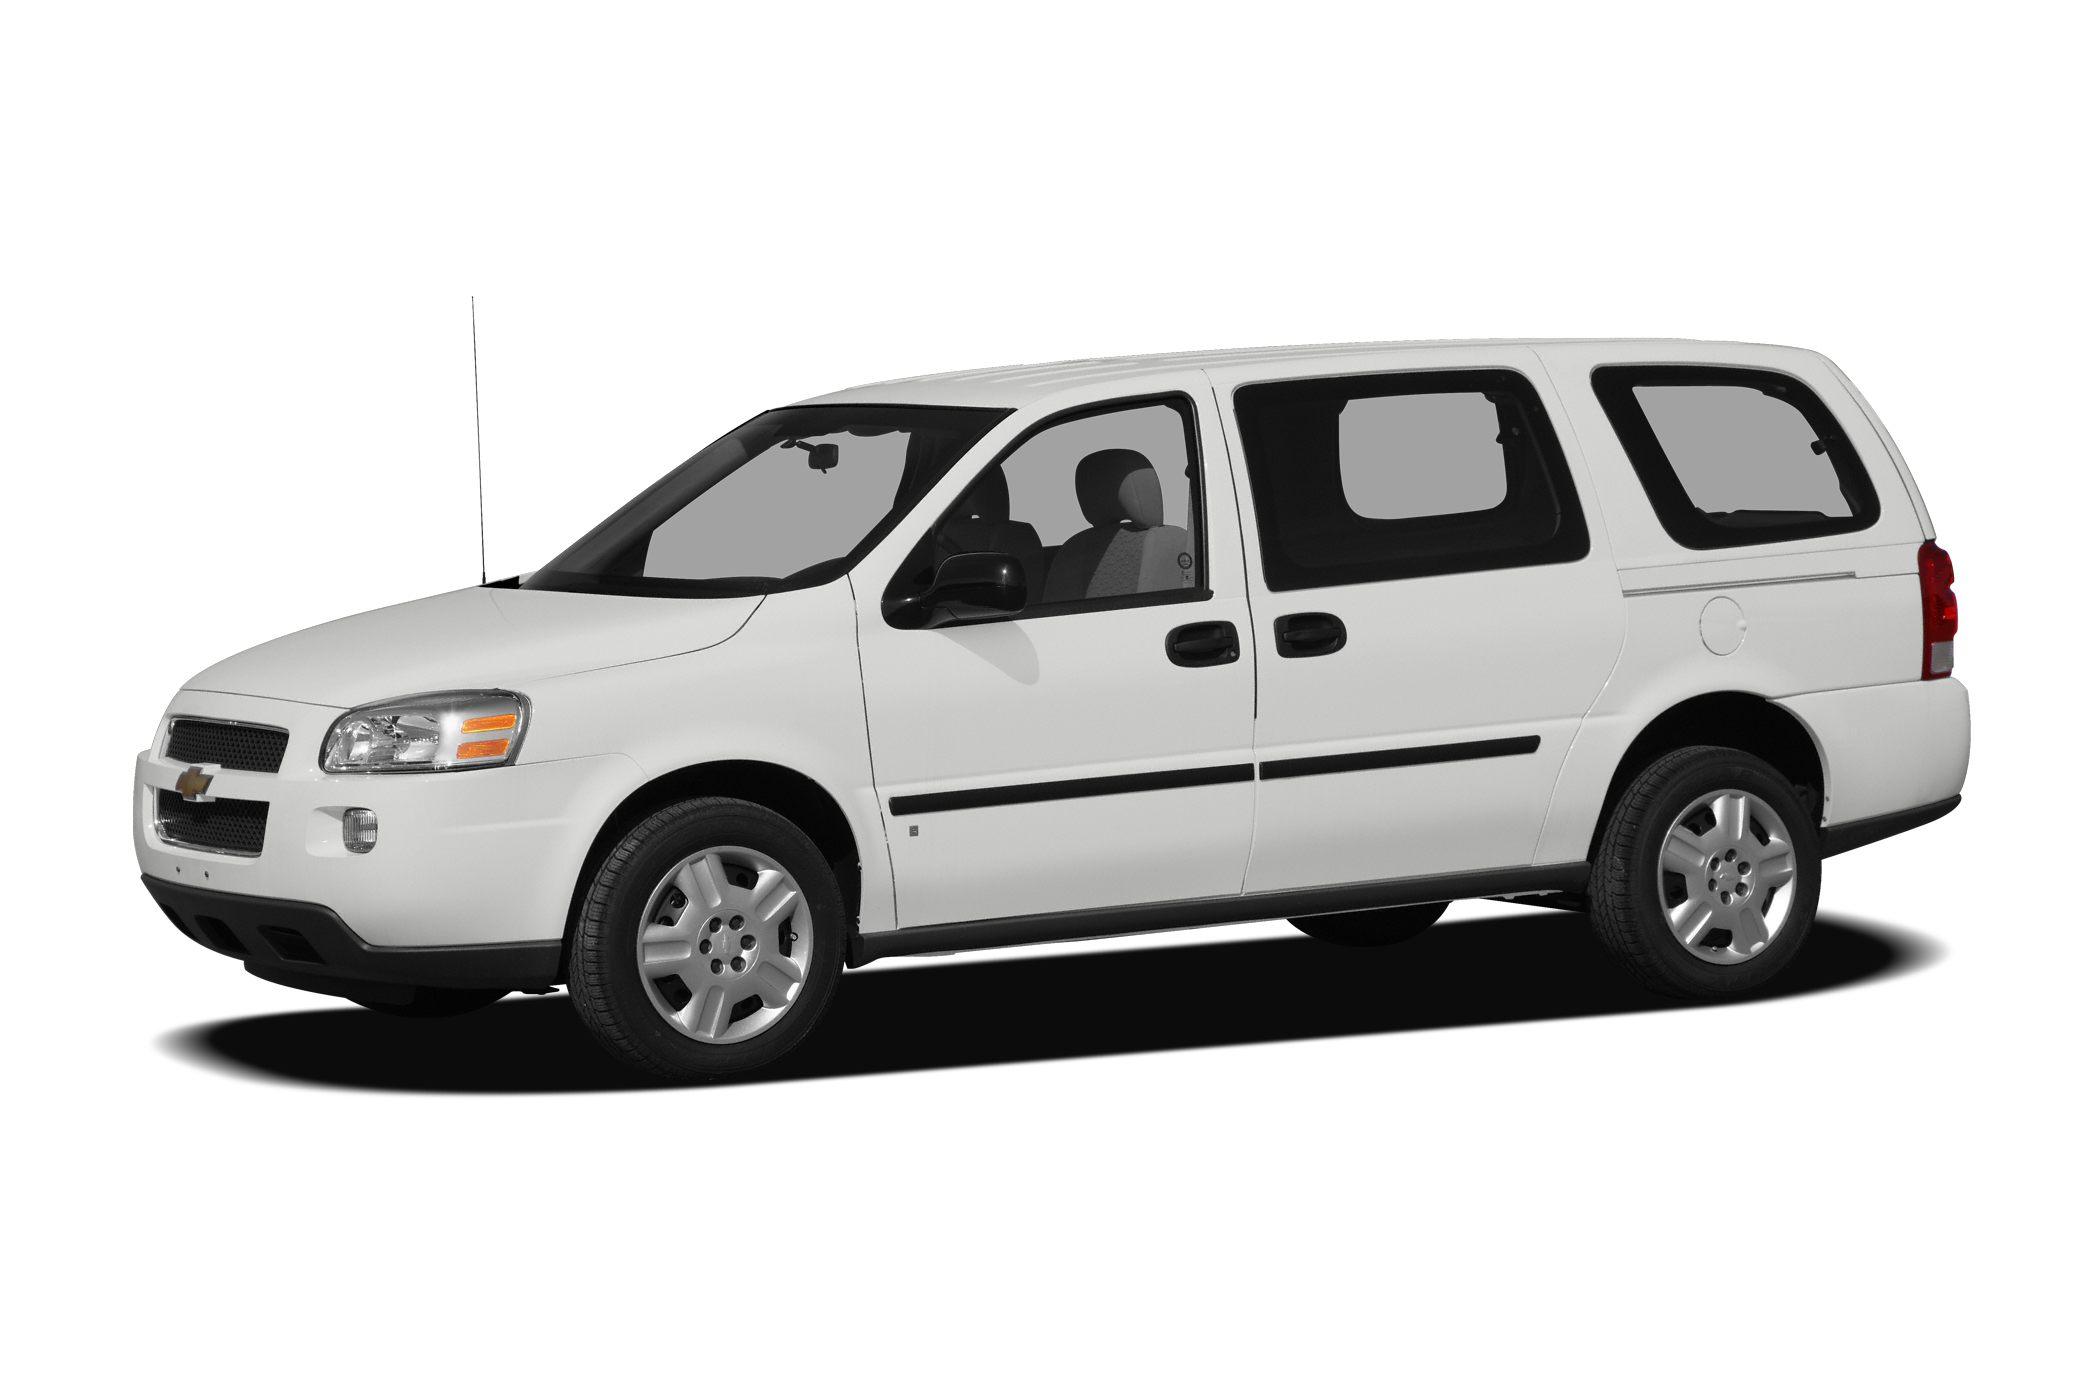 2008 Chevrolet Uplander Cargo w/2FL Front-wheel Drive Cargo Van Specs and  Prices